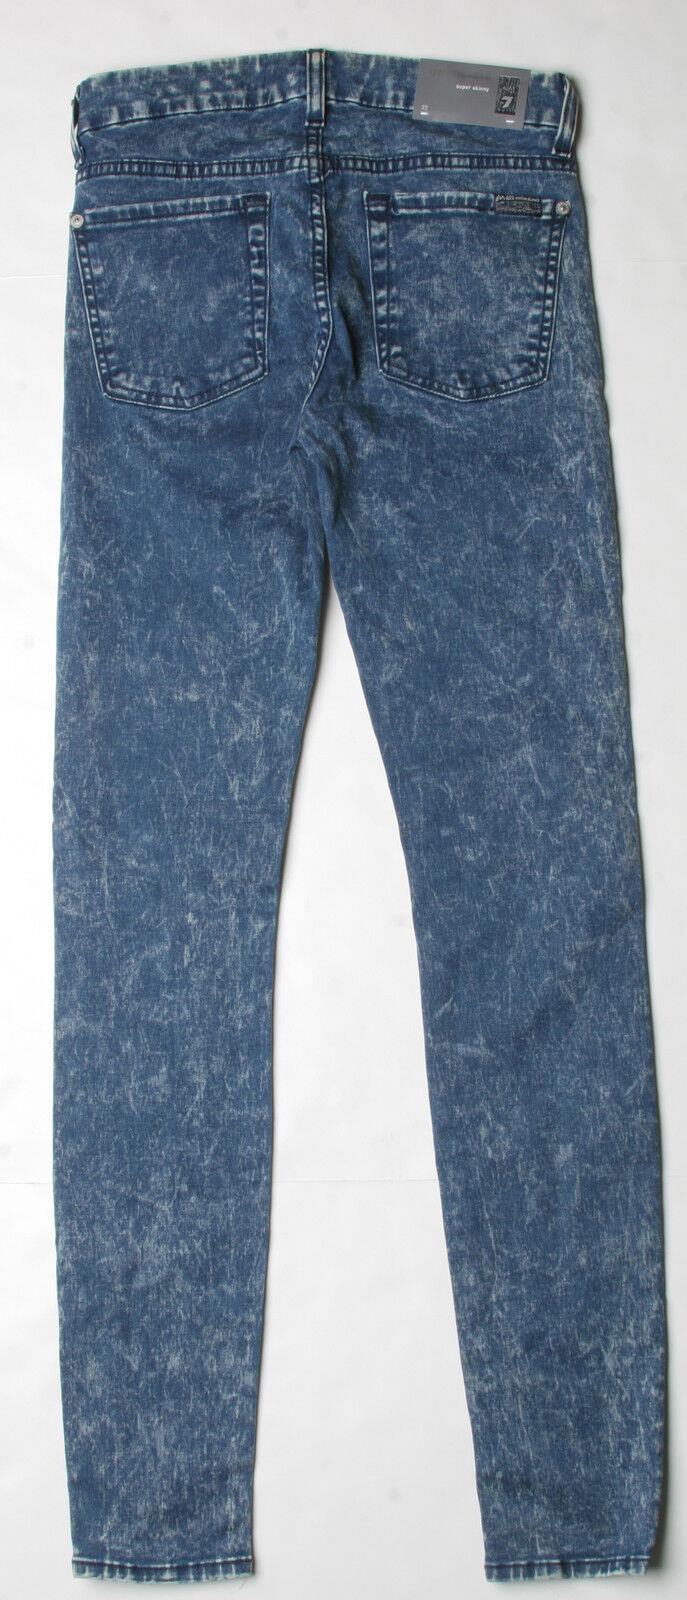 7 para Mankind Gwenevere Gwenevere Gwenevere Super Skinny Jeans All (26) Azul mineral lavado AU0168660 7f756b